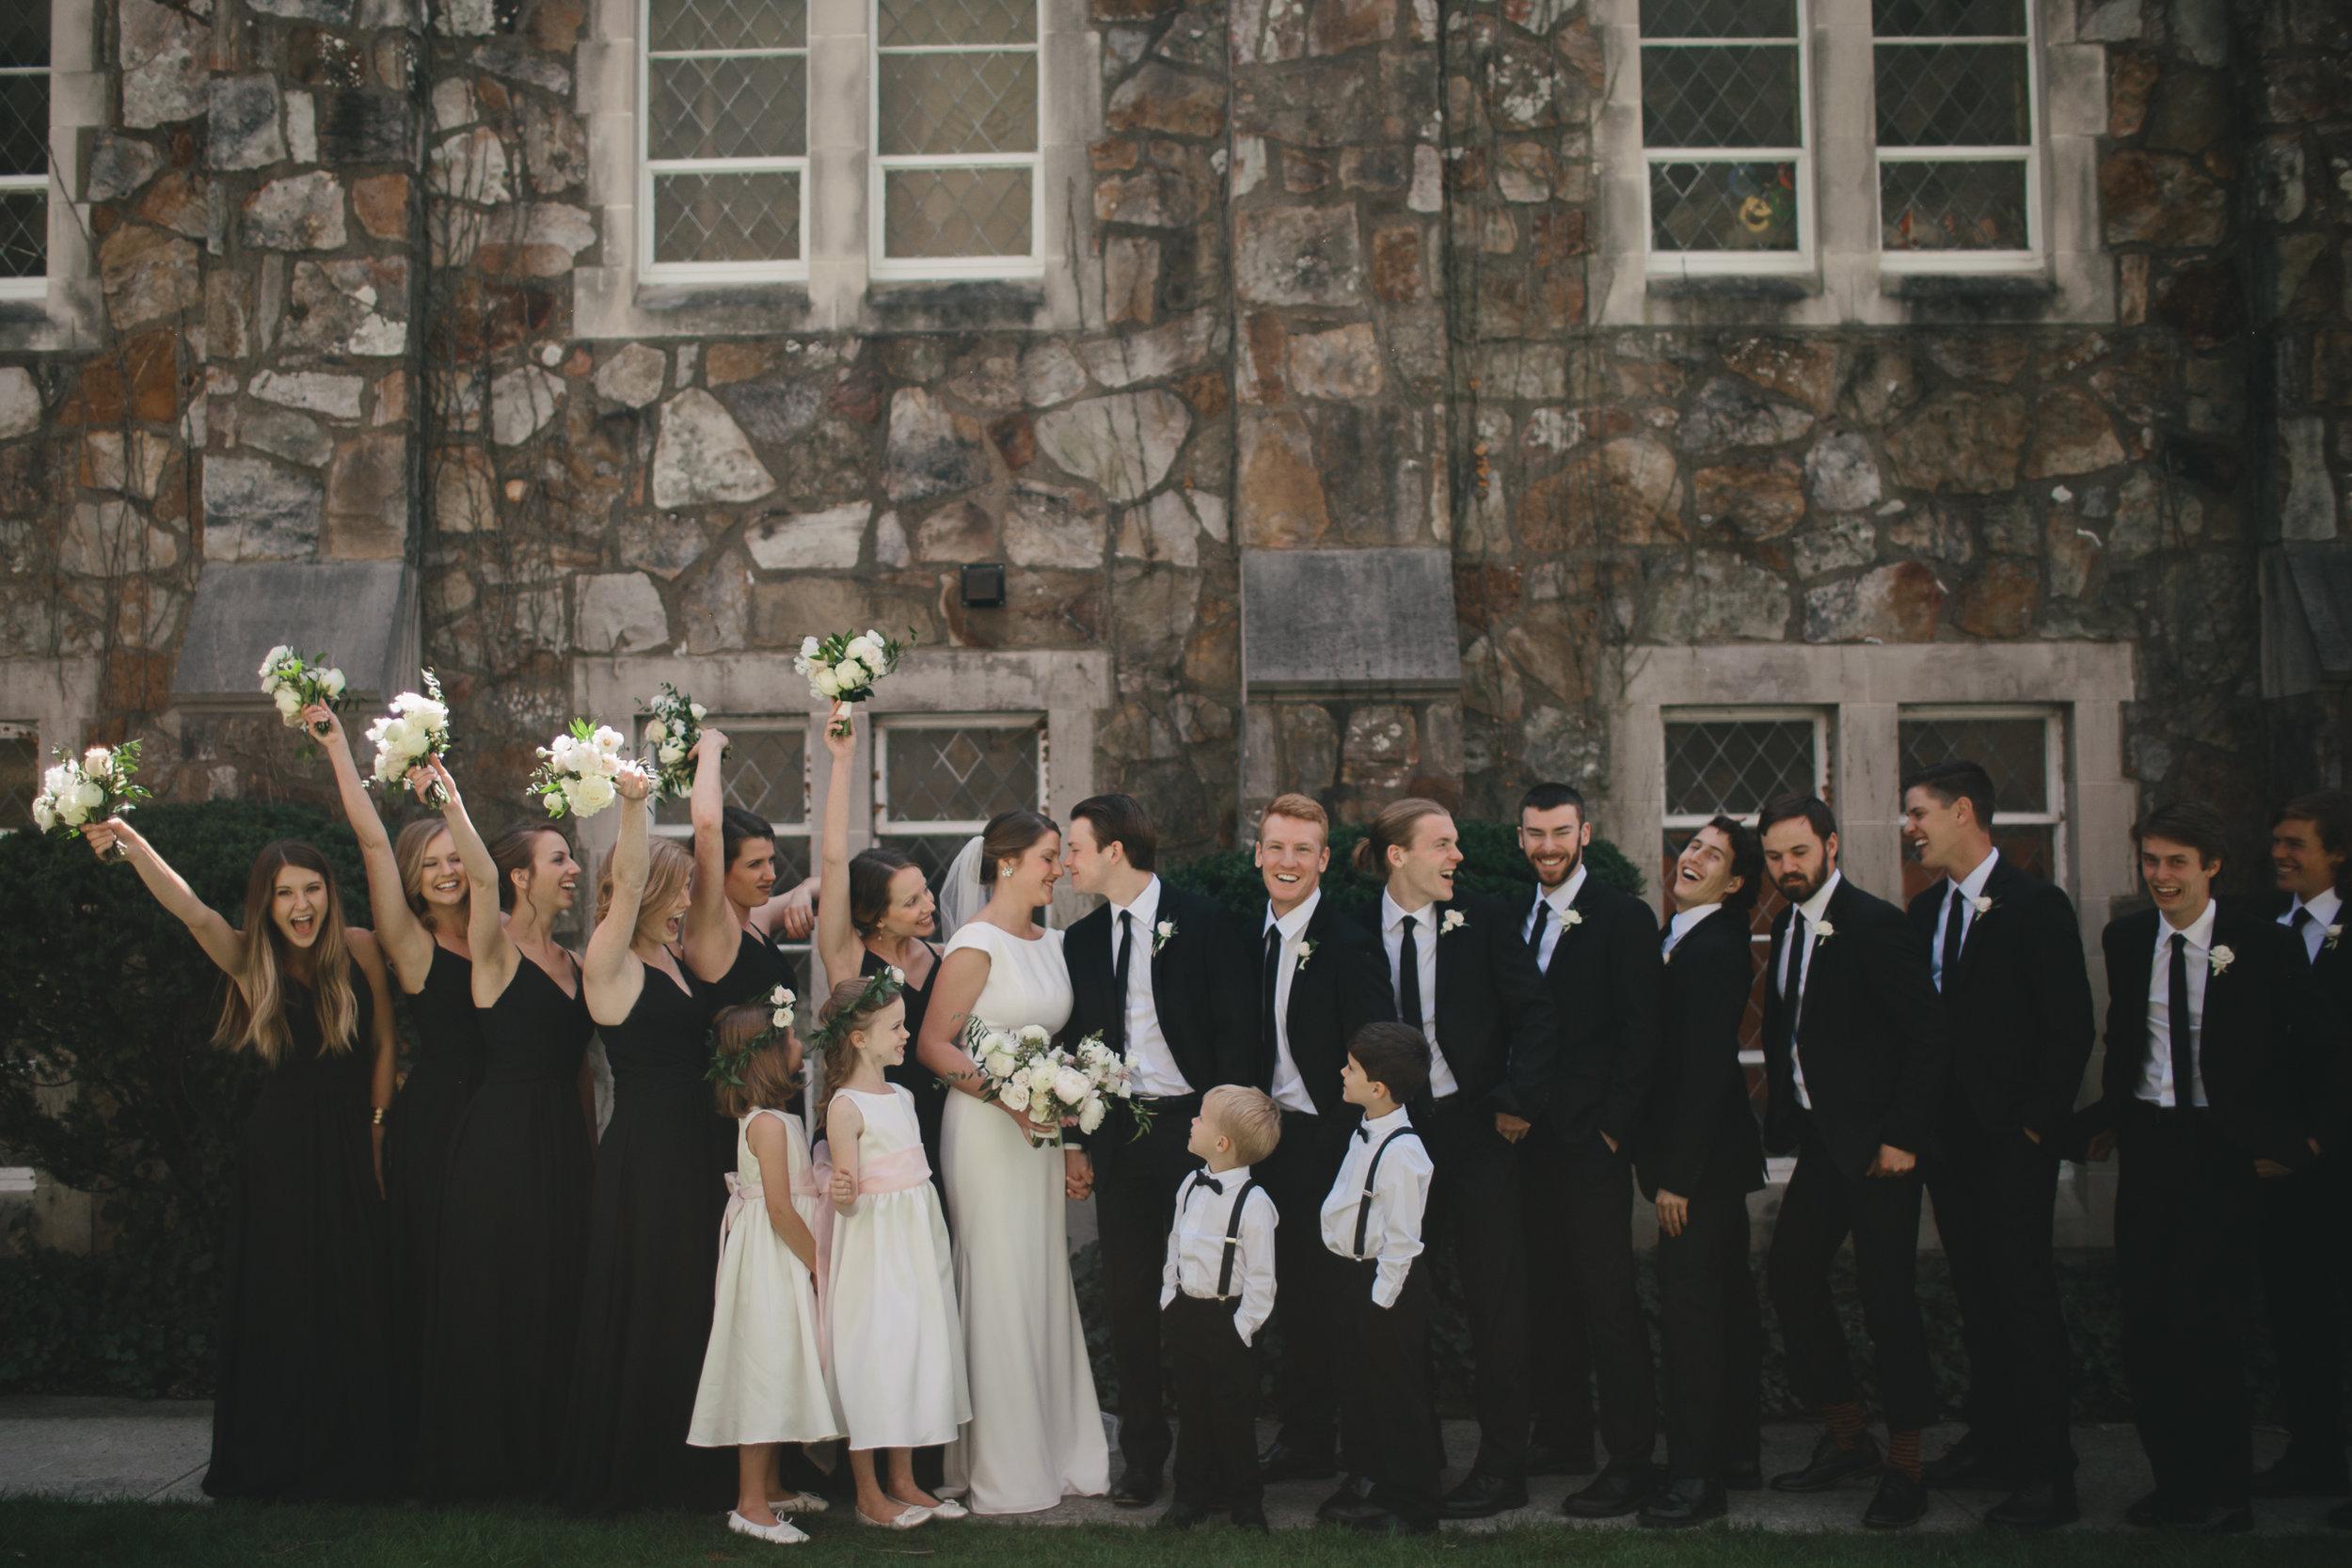 carolandgrahamwedding-221.jpg